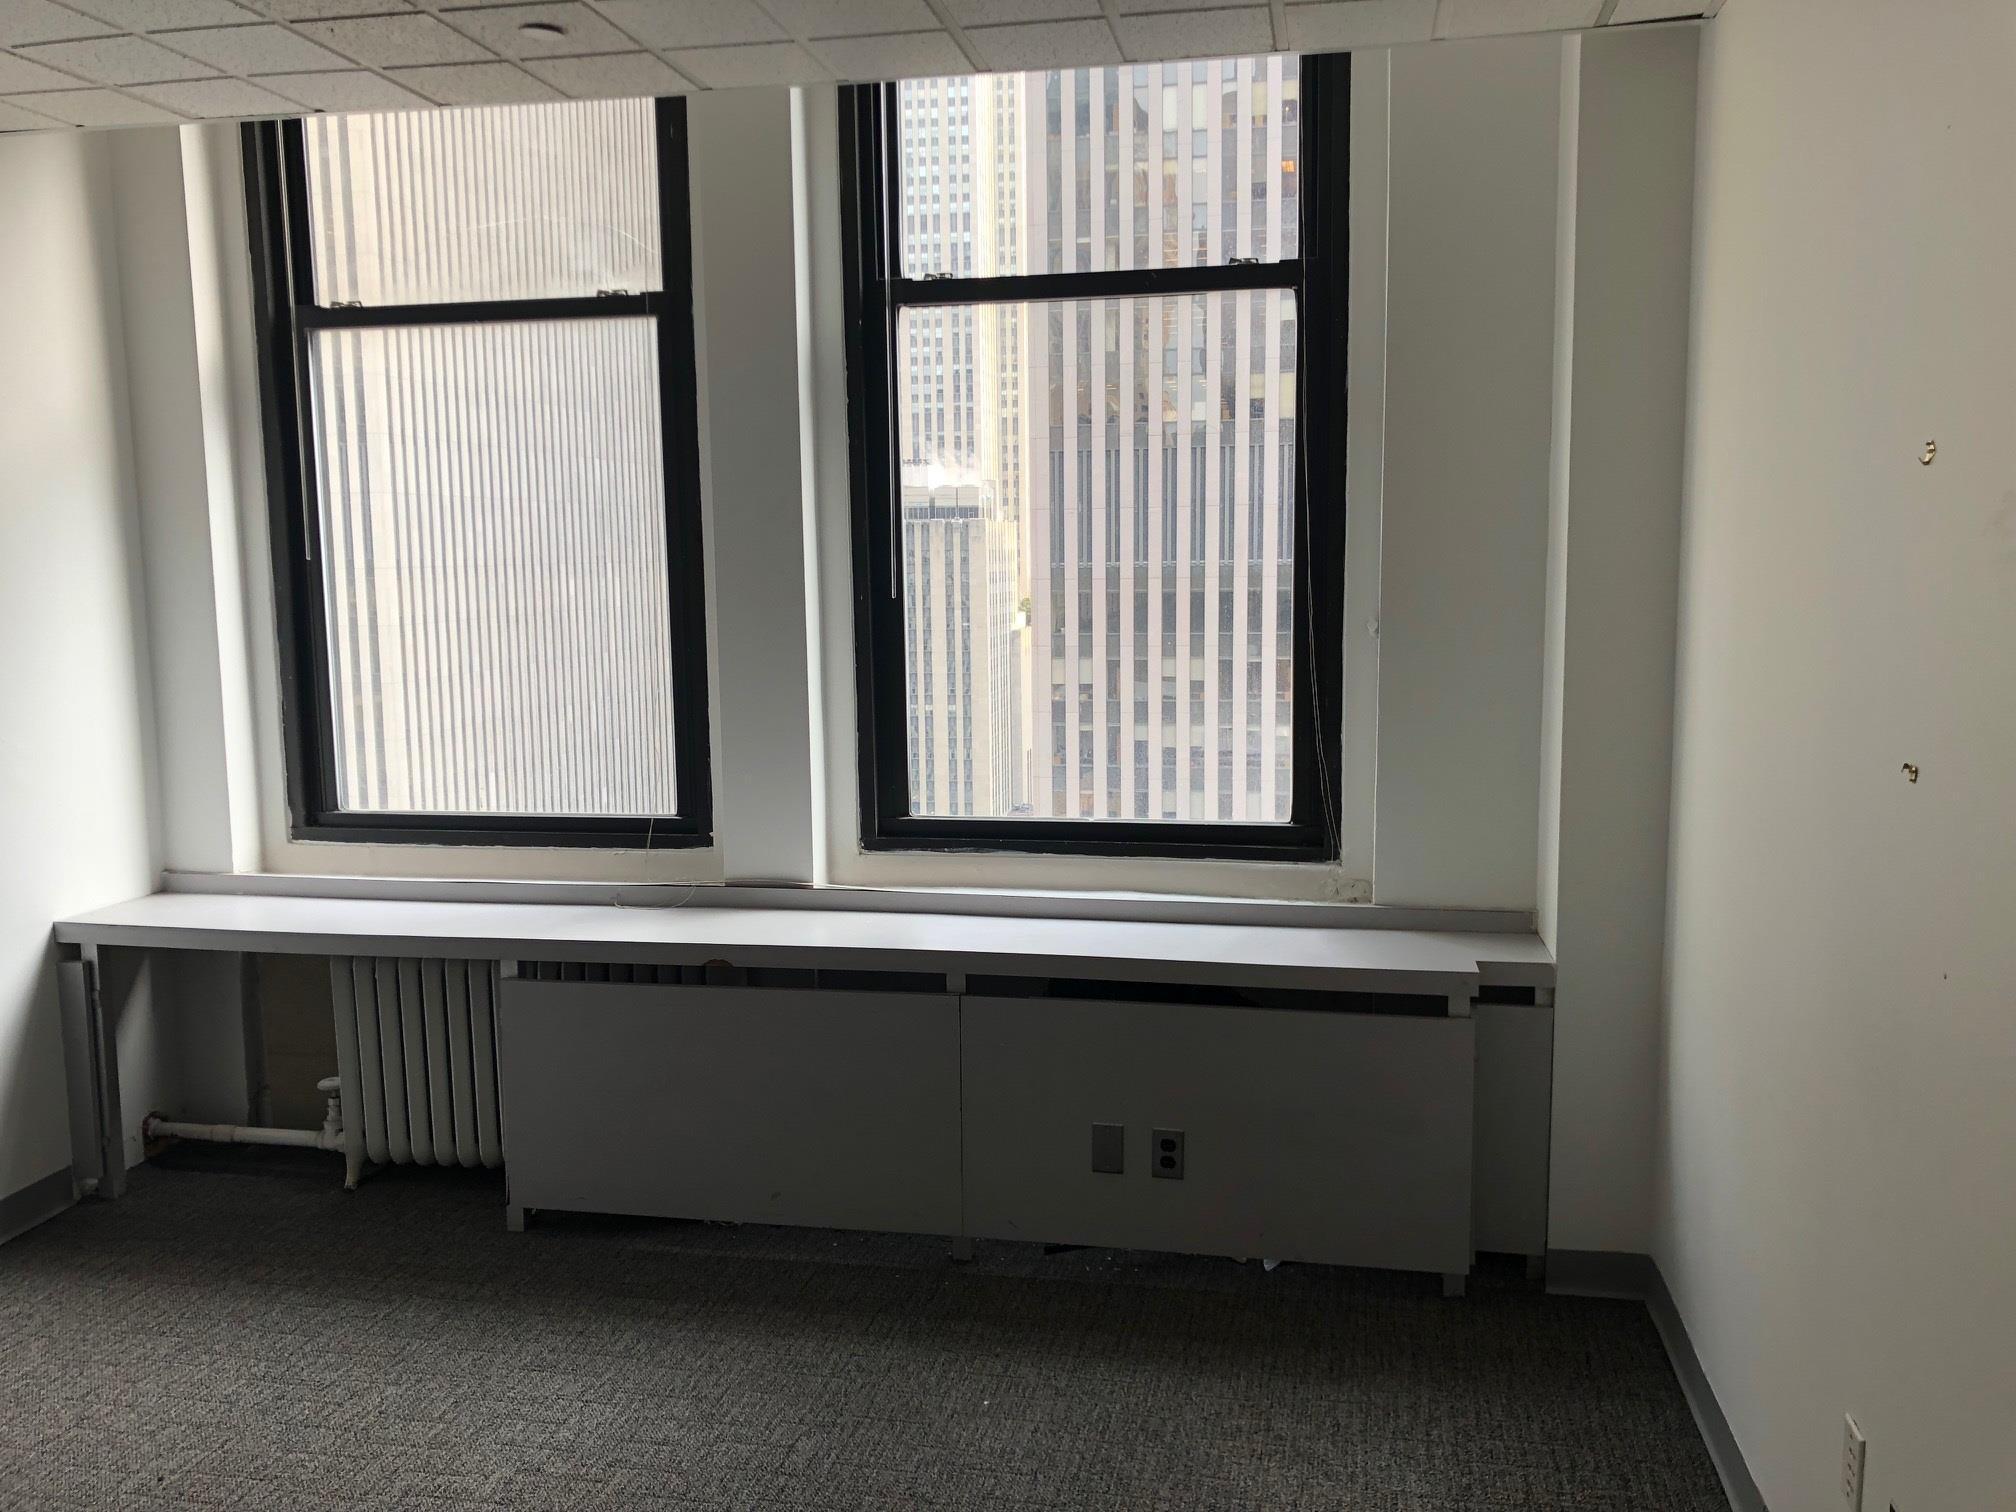 729 Seventh Avenue - Office 1